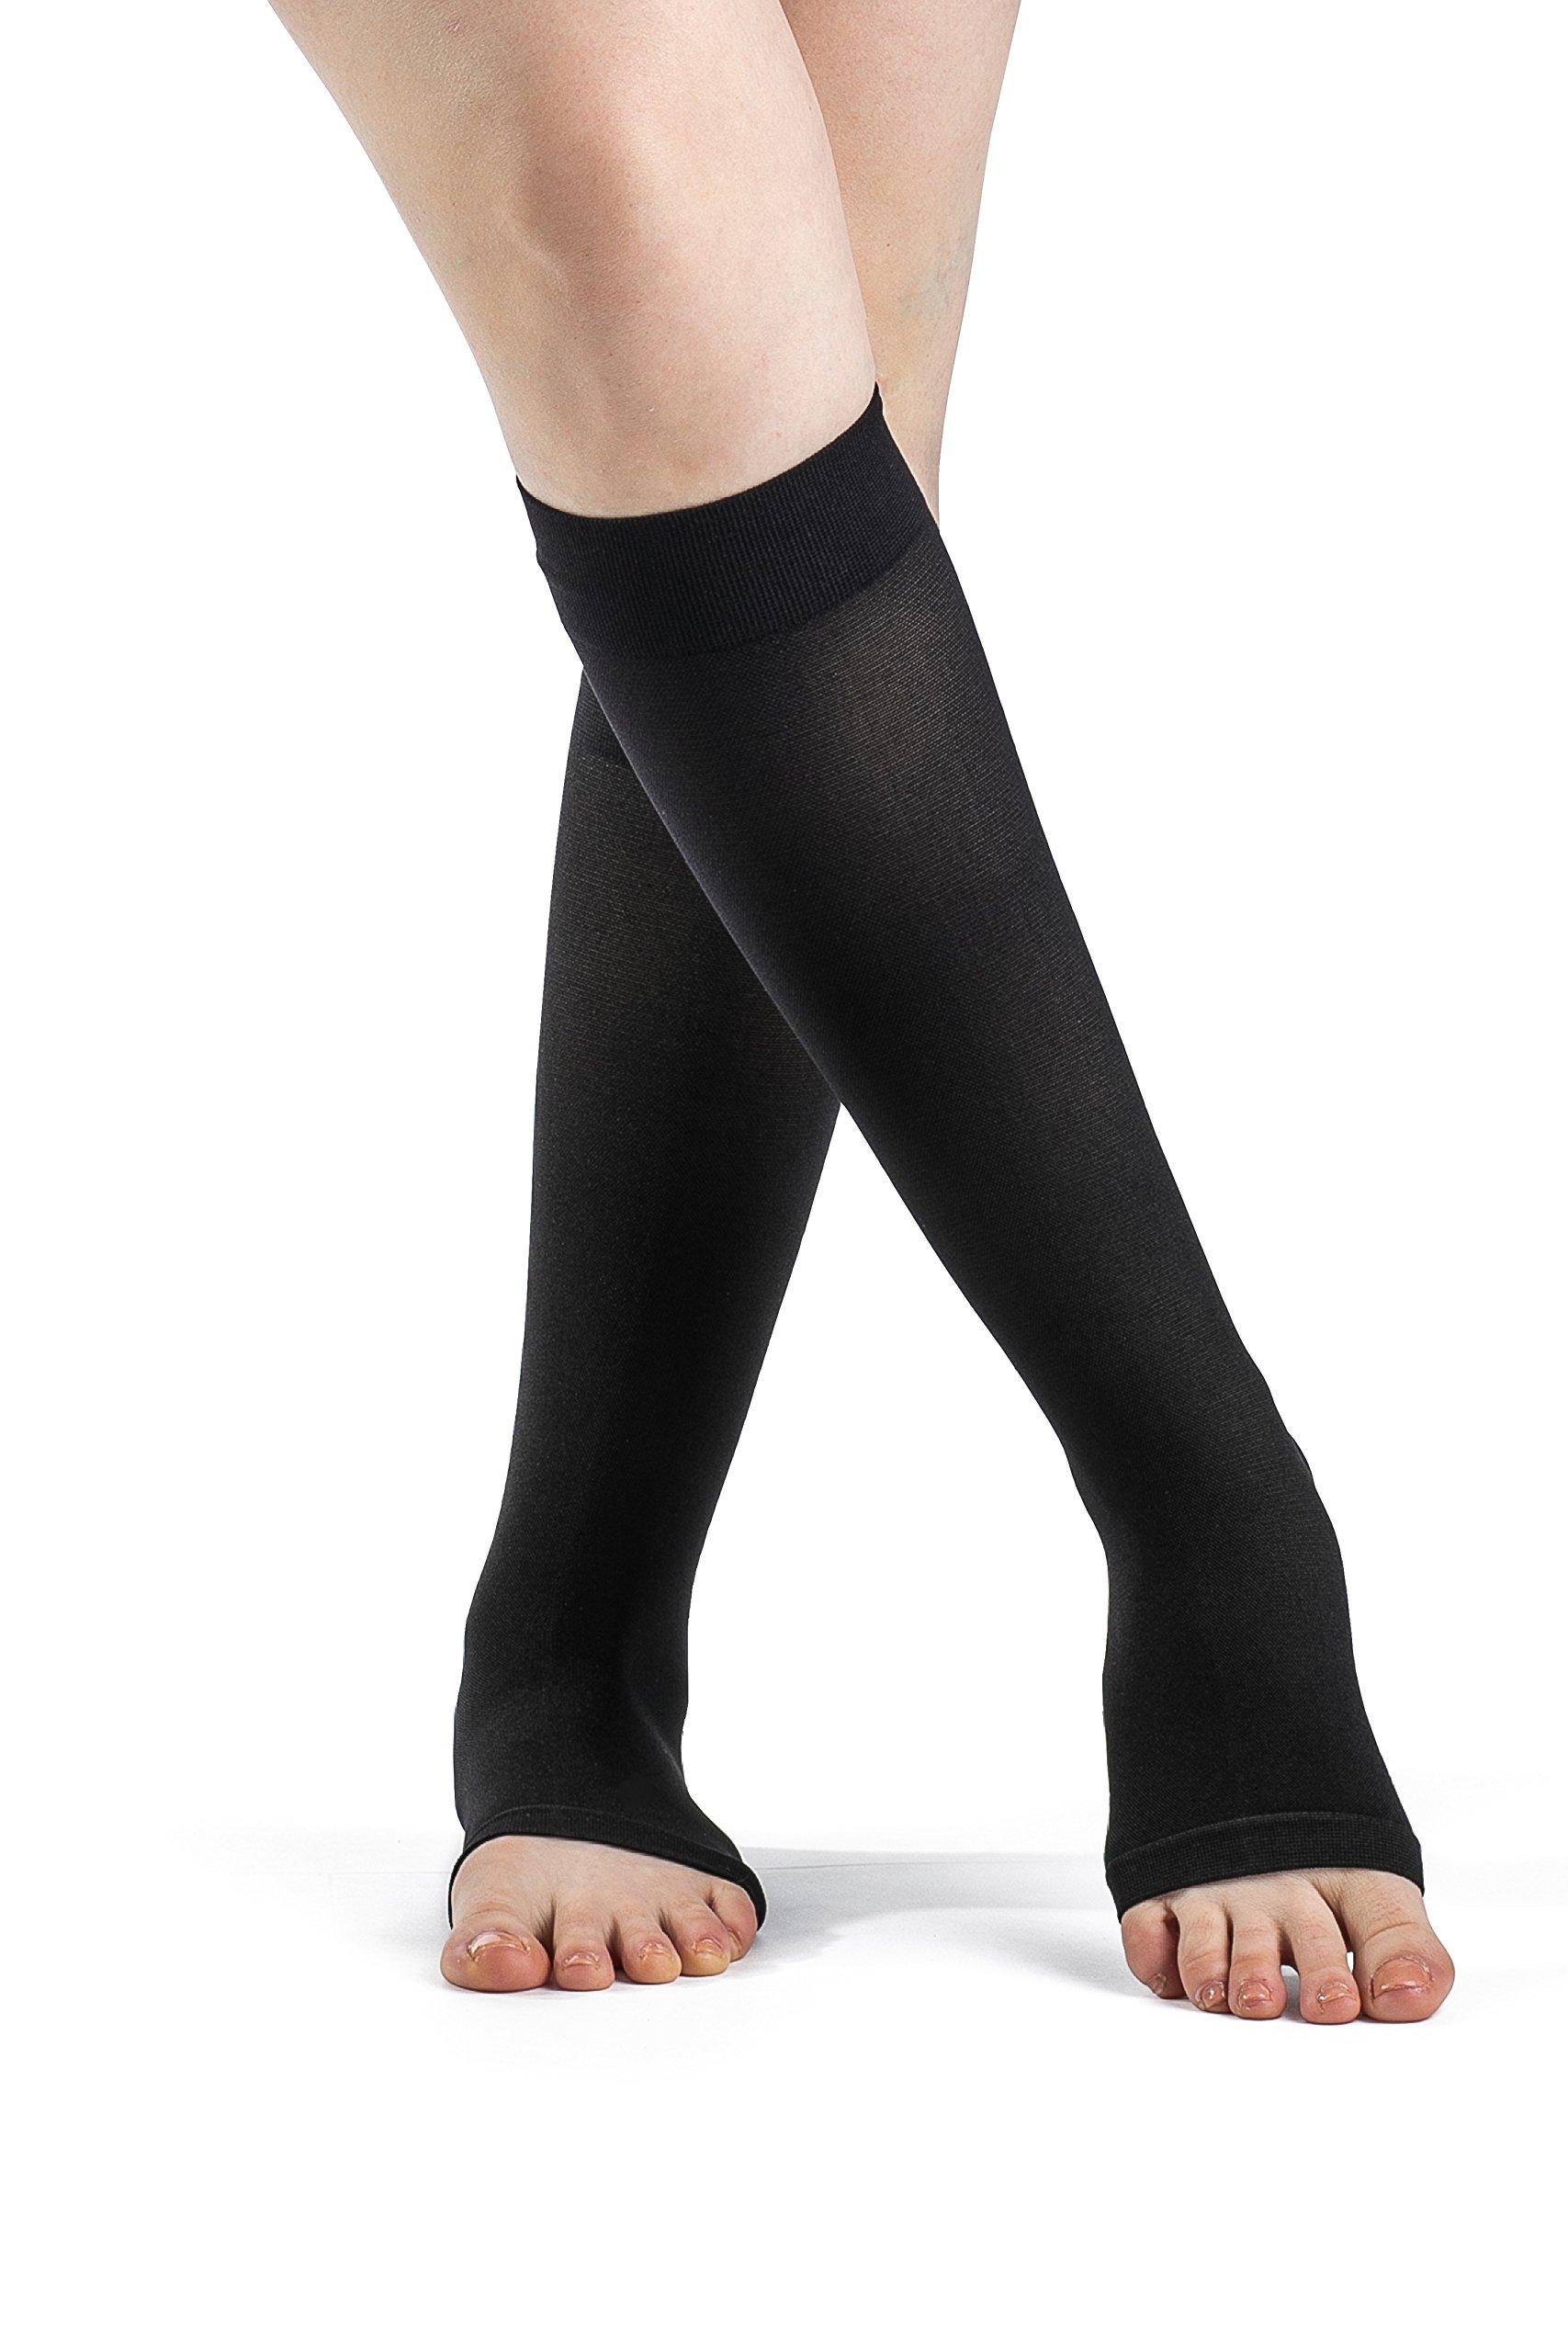 SIGVARIS Women's Access 970 Open-Toe Calf High Medical Compression 30-40mmHg